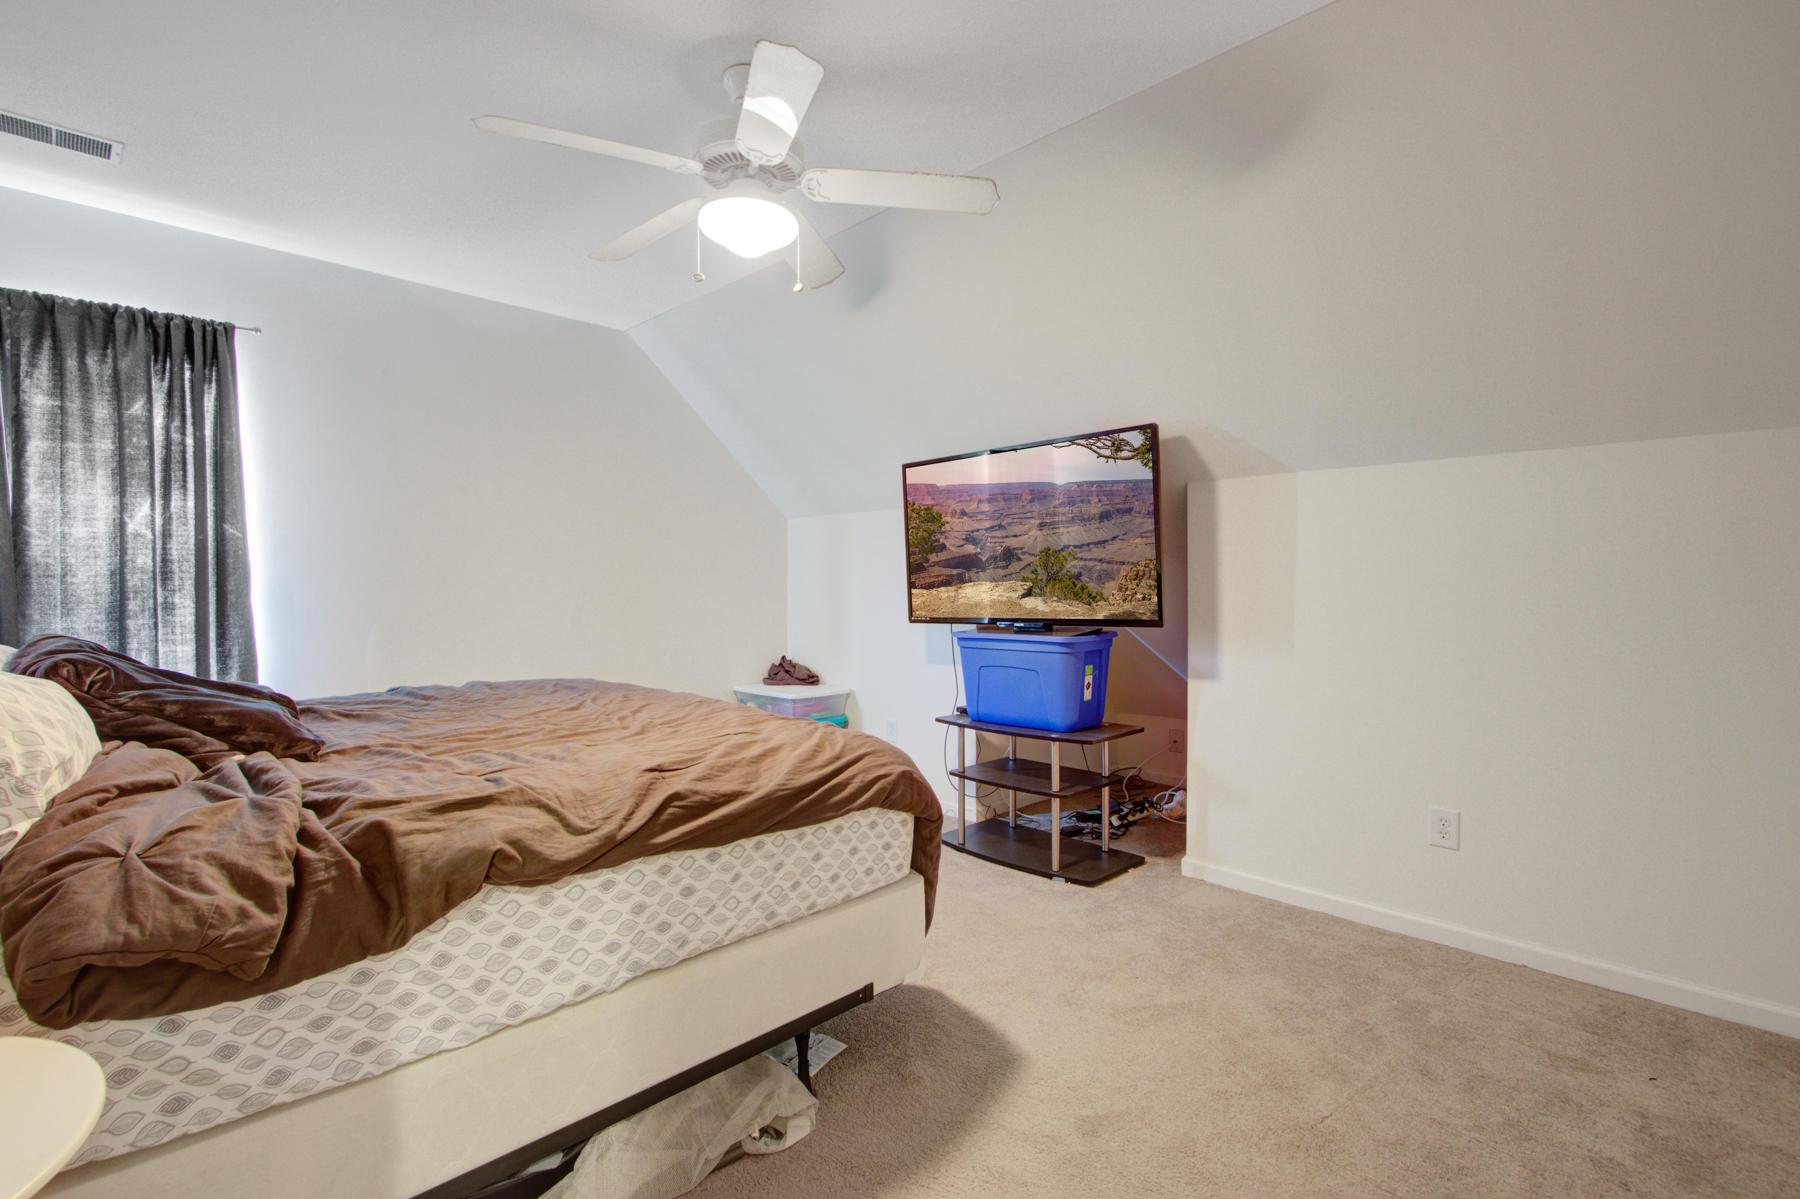 Dunes West Homes For Sale - 2232 Kings Gate, Mount Pleasant, SC - 13